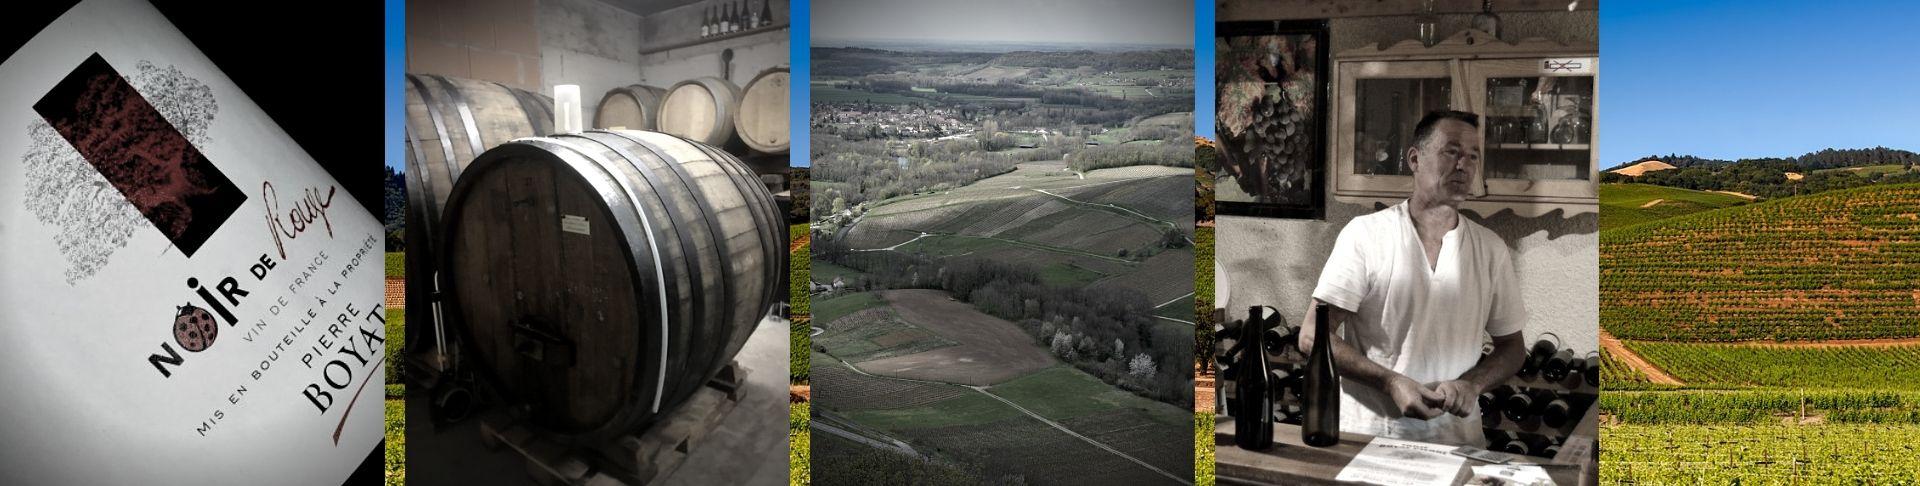 Domaine Pierre Boyat | Vente en Ligne | Vins Bio